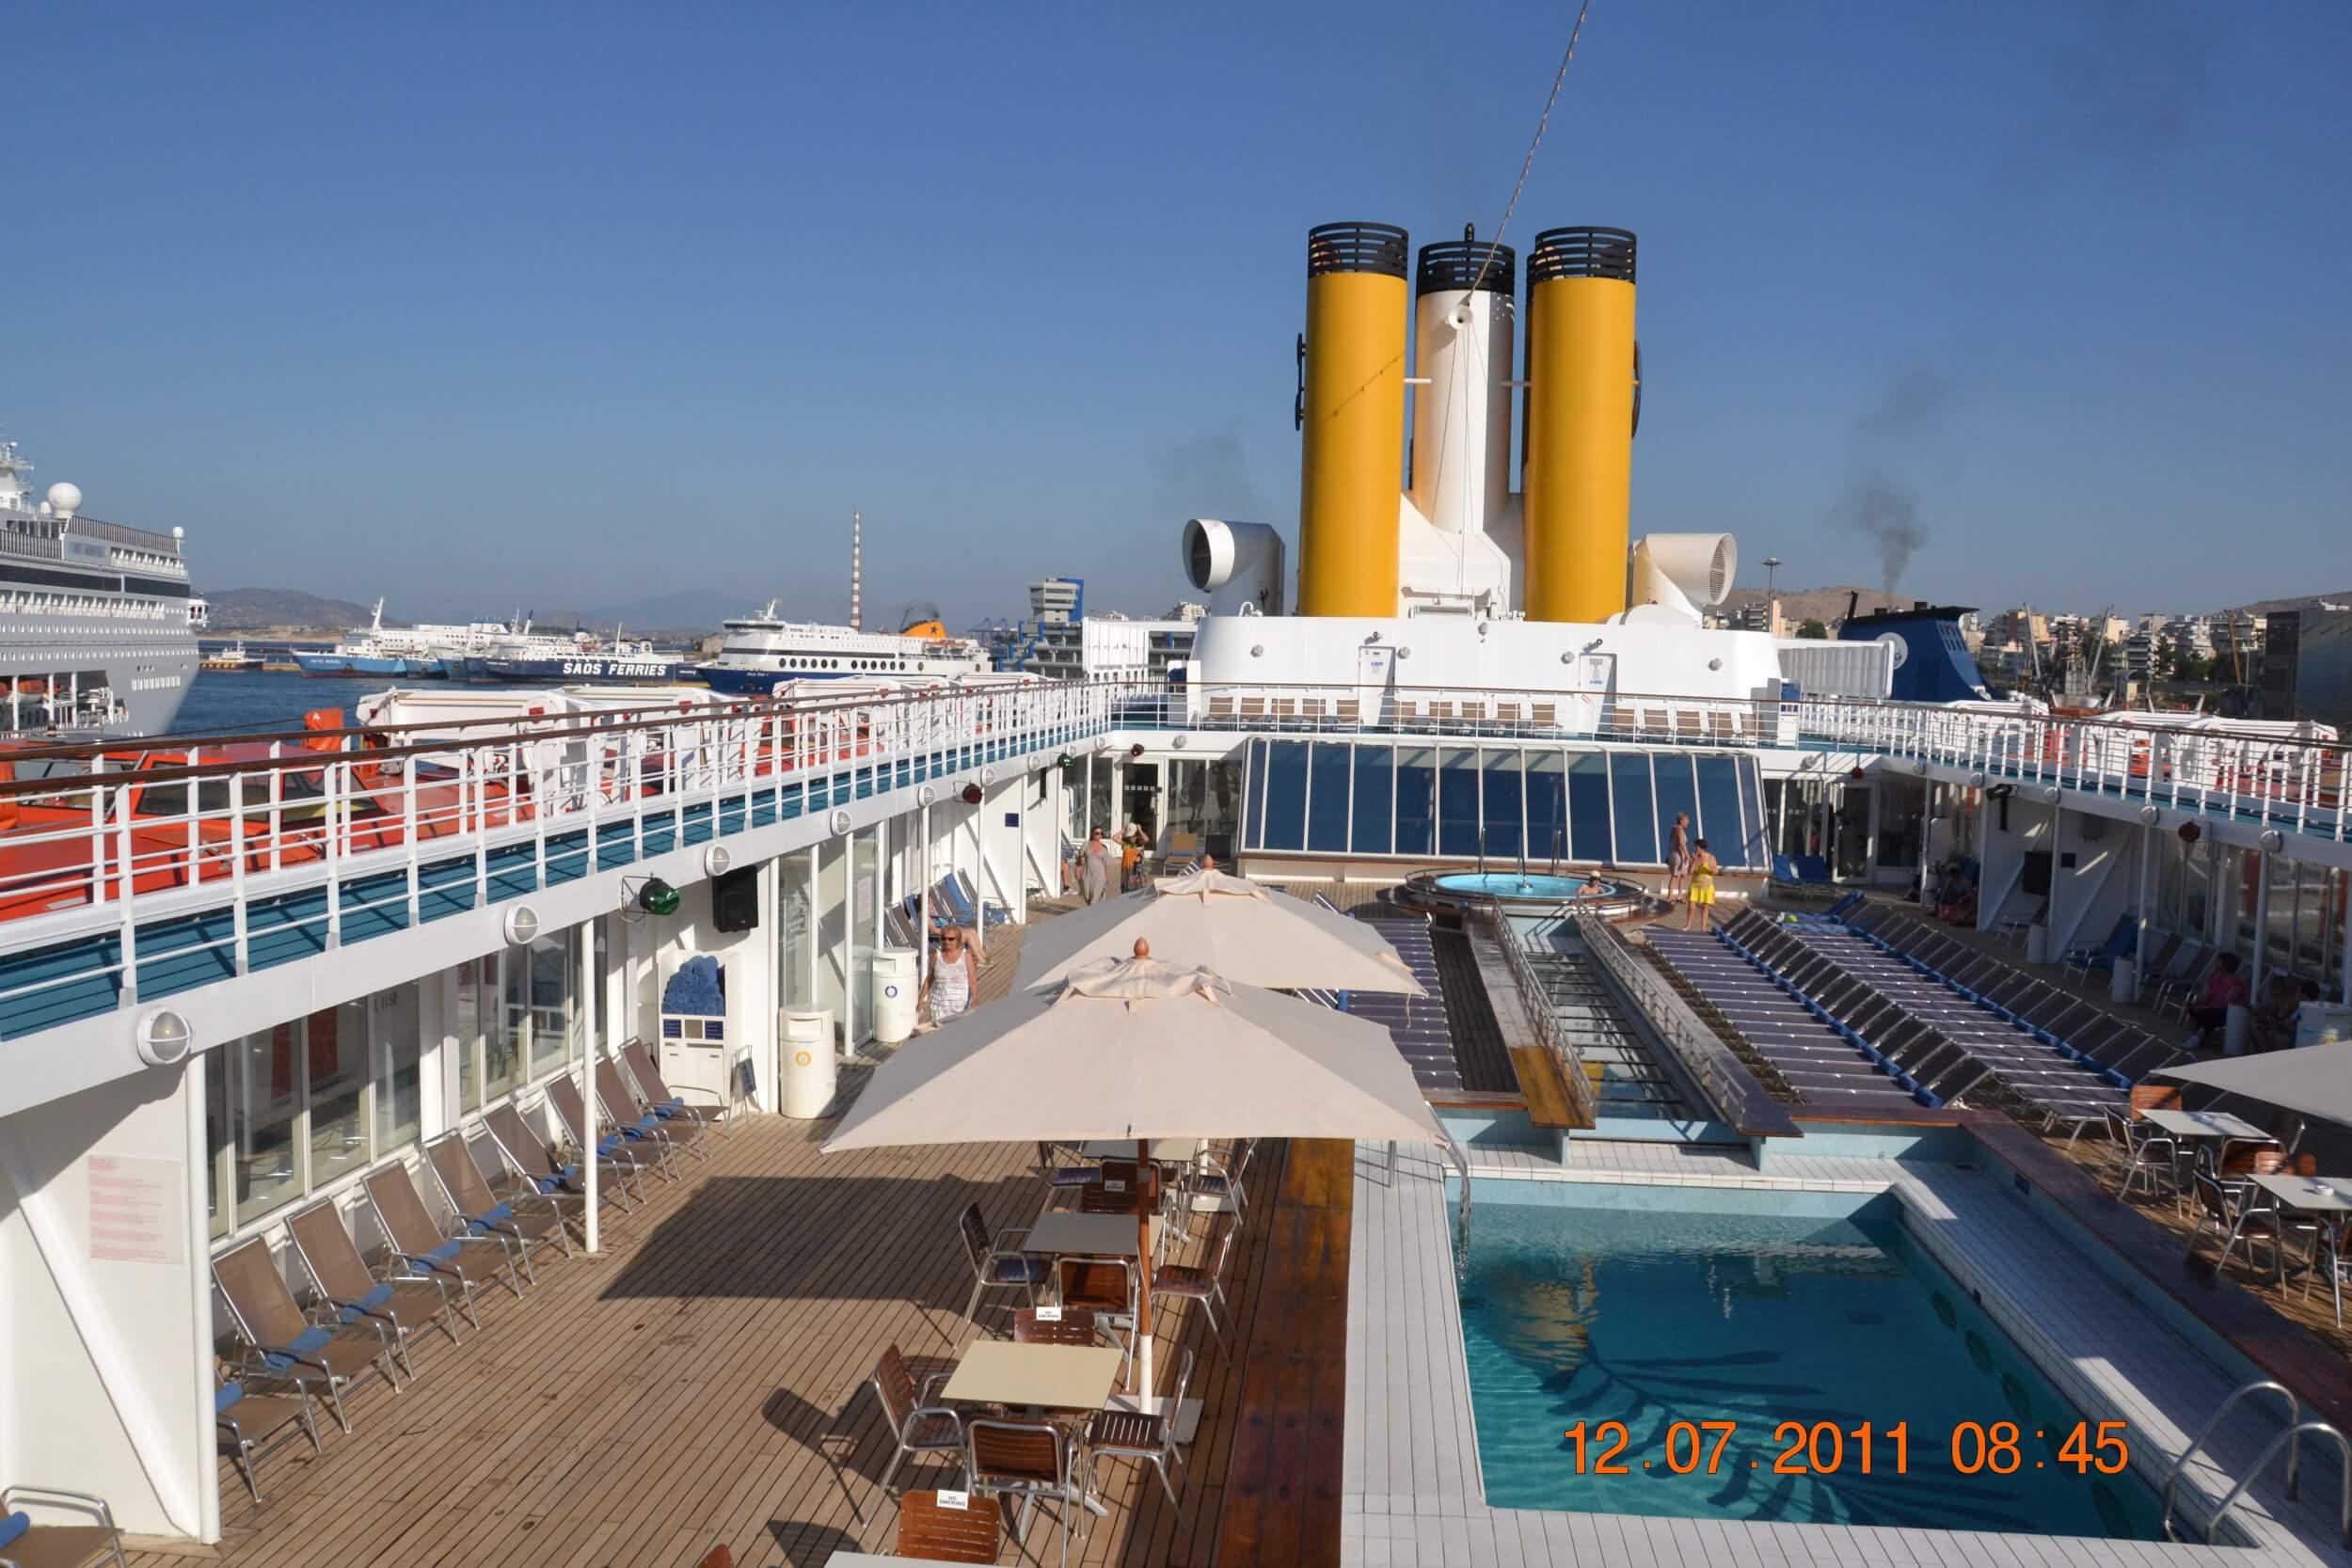 Kreuzfahrtschiff (c) champmol / flickr.com